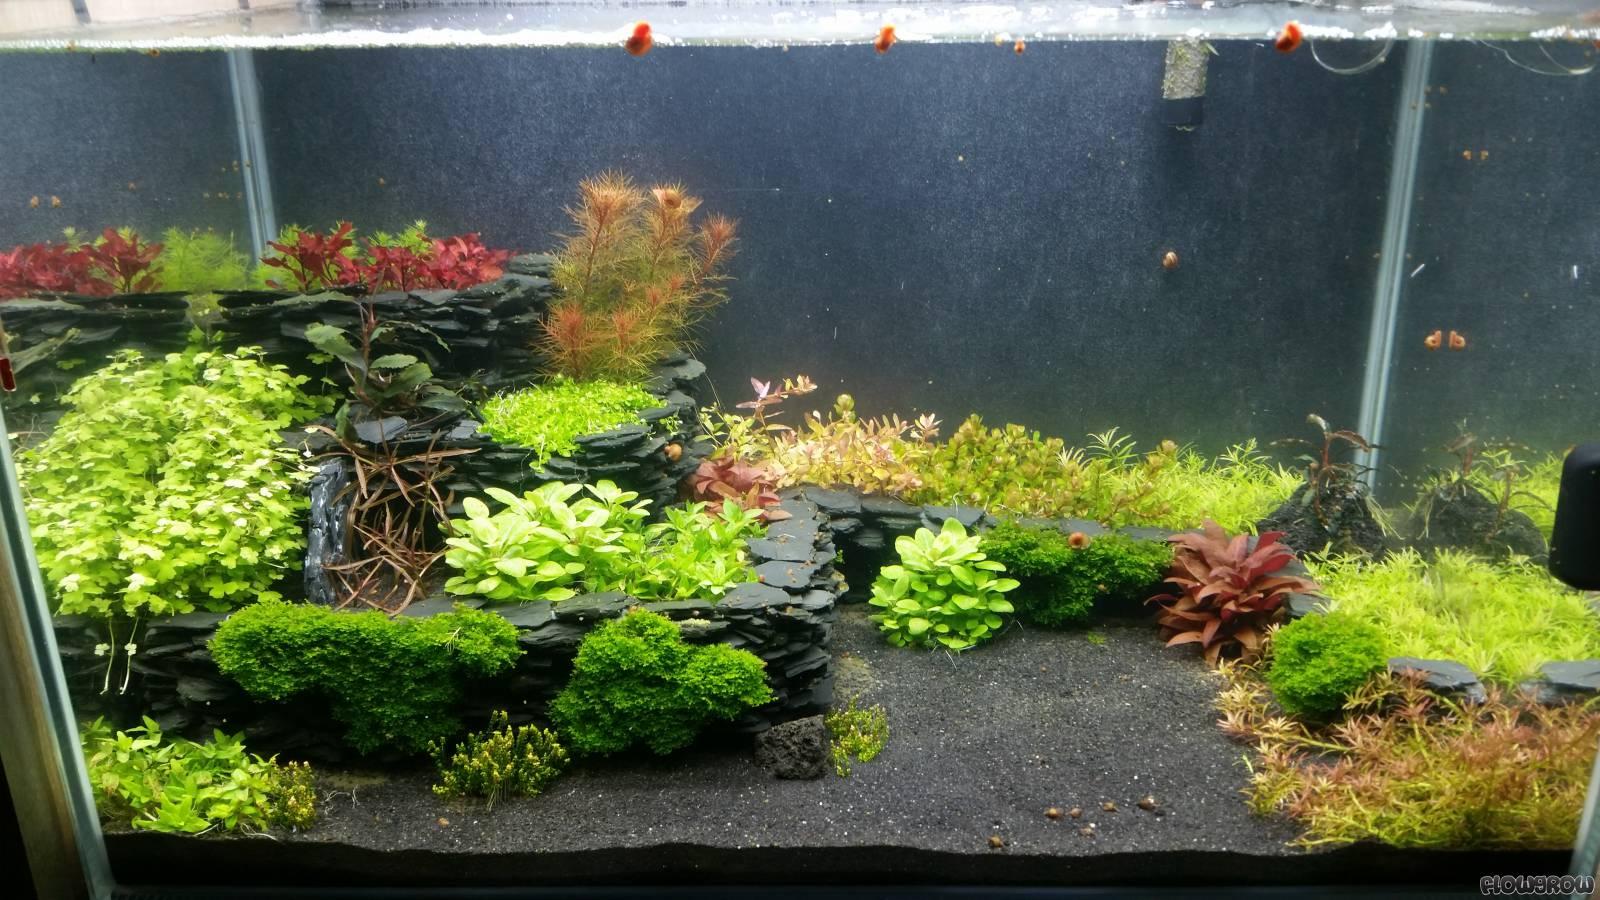 dennis 39 schiefer steps flowgrow aquascape aquarien datenbank. Black Bedroom Furniture Sets. Home Design Ideas